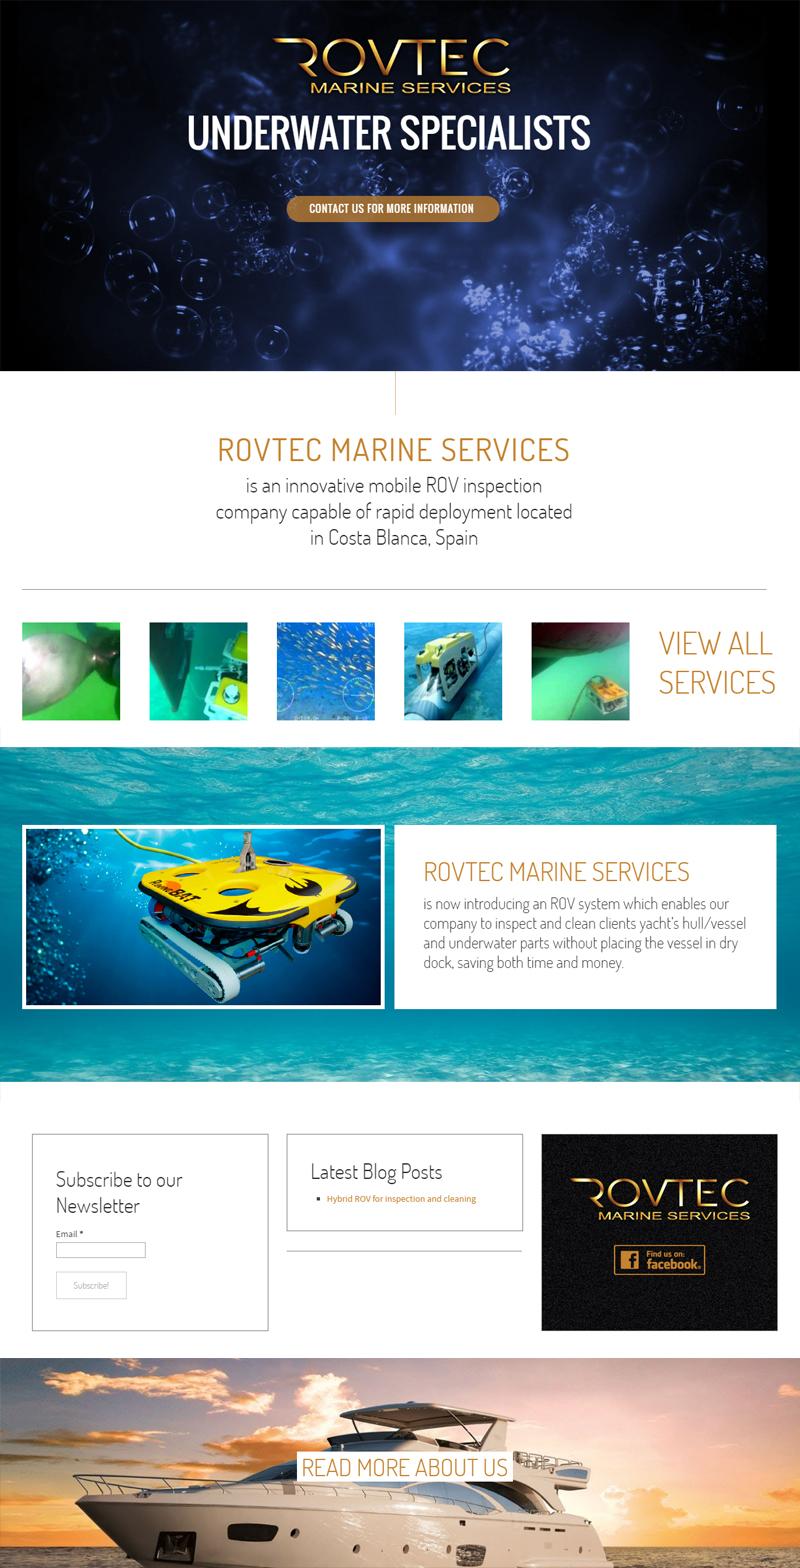 Rovtec Marine Services